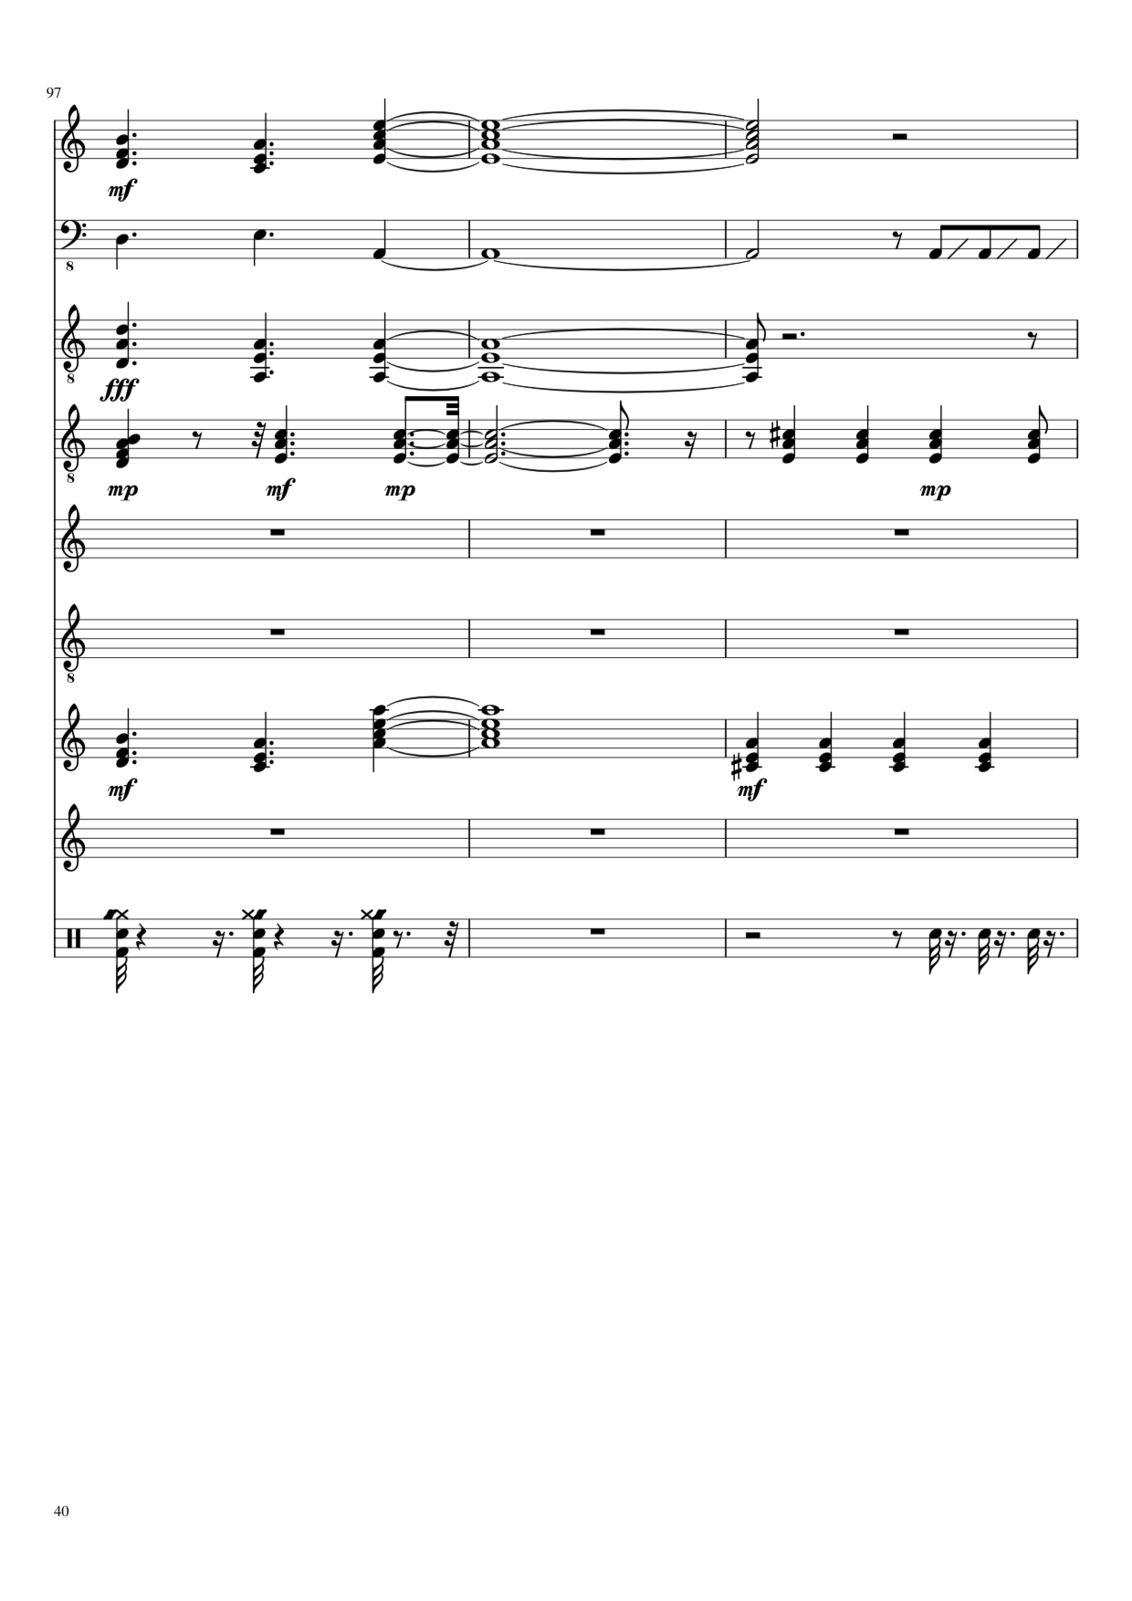 Mrs. Vandebilt slide, Image 40